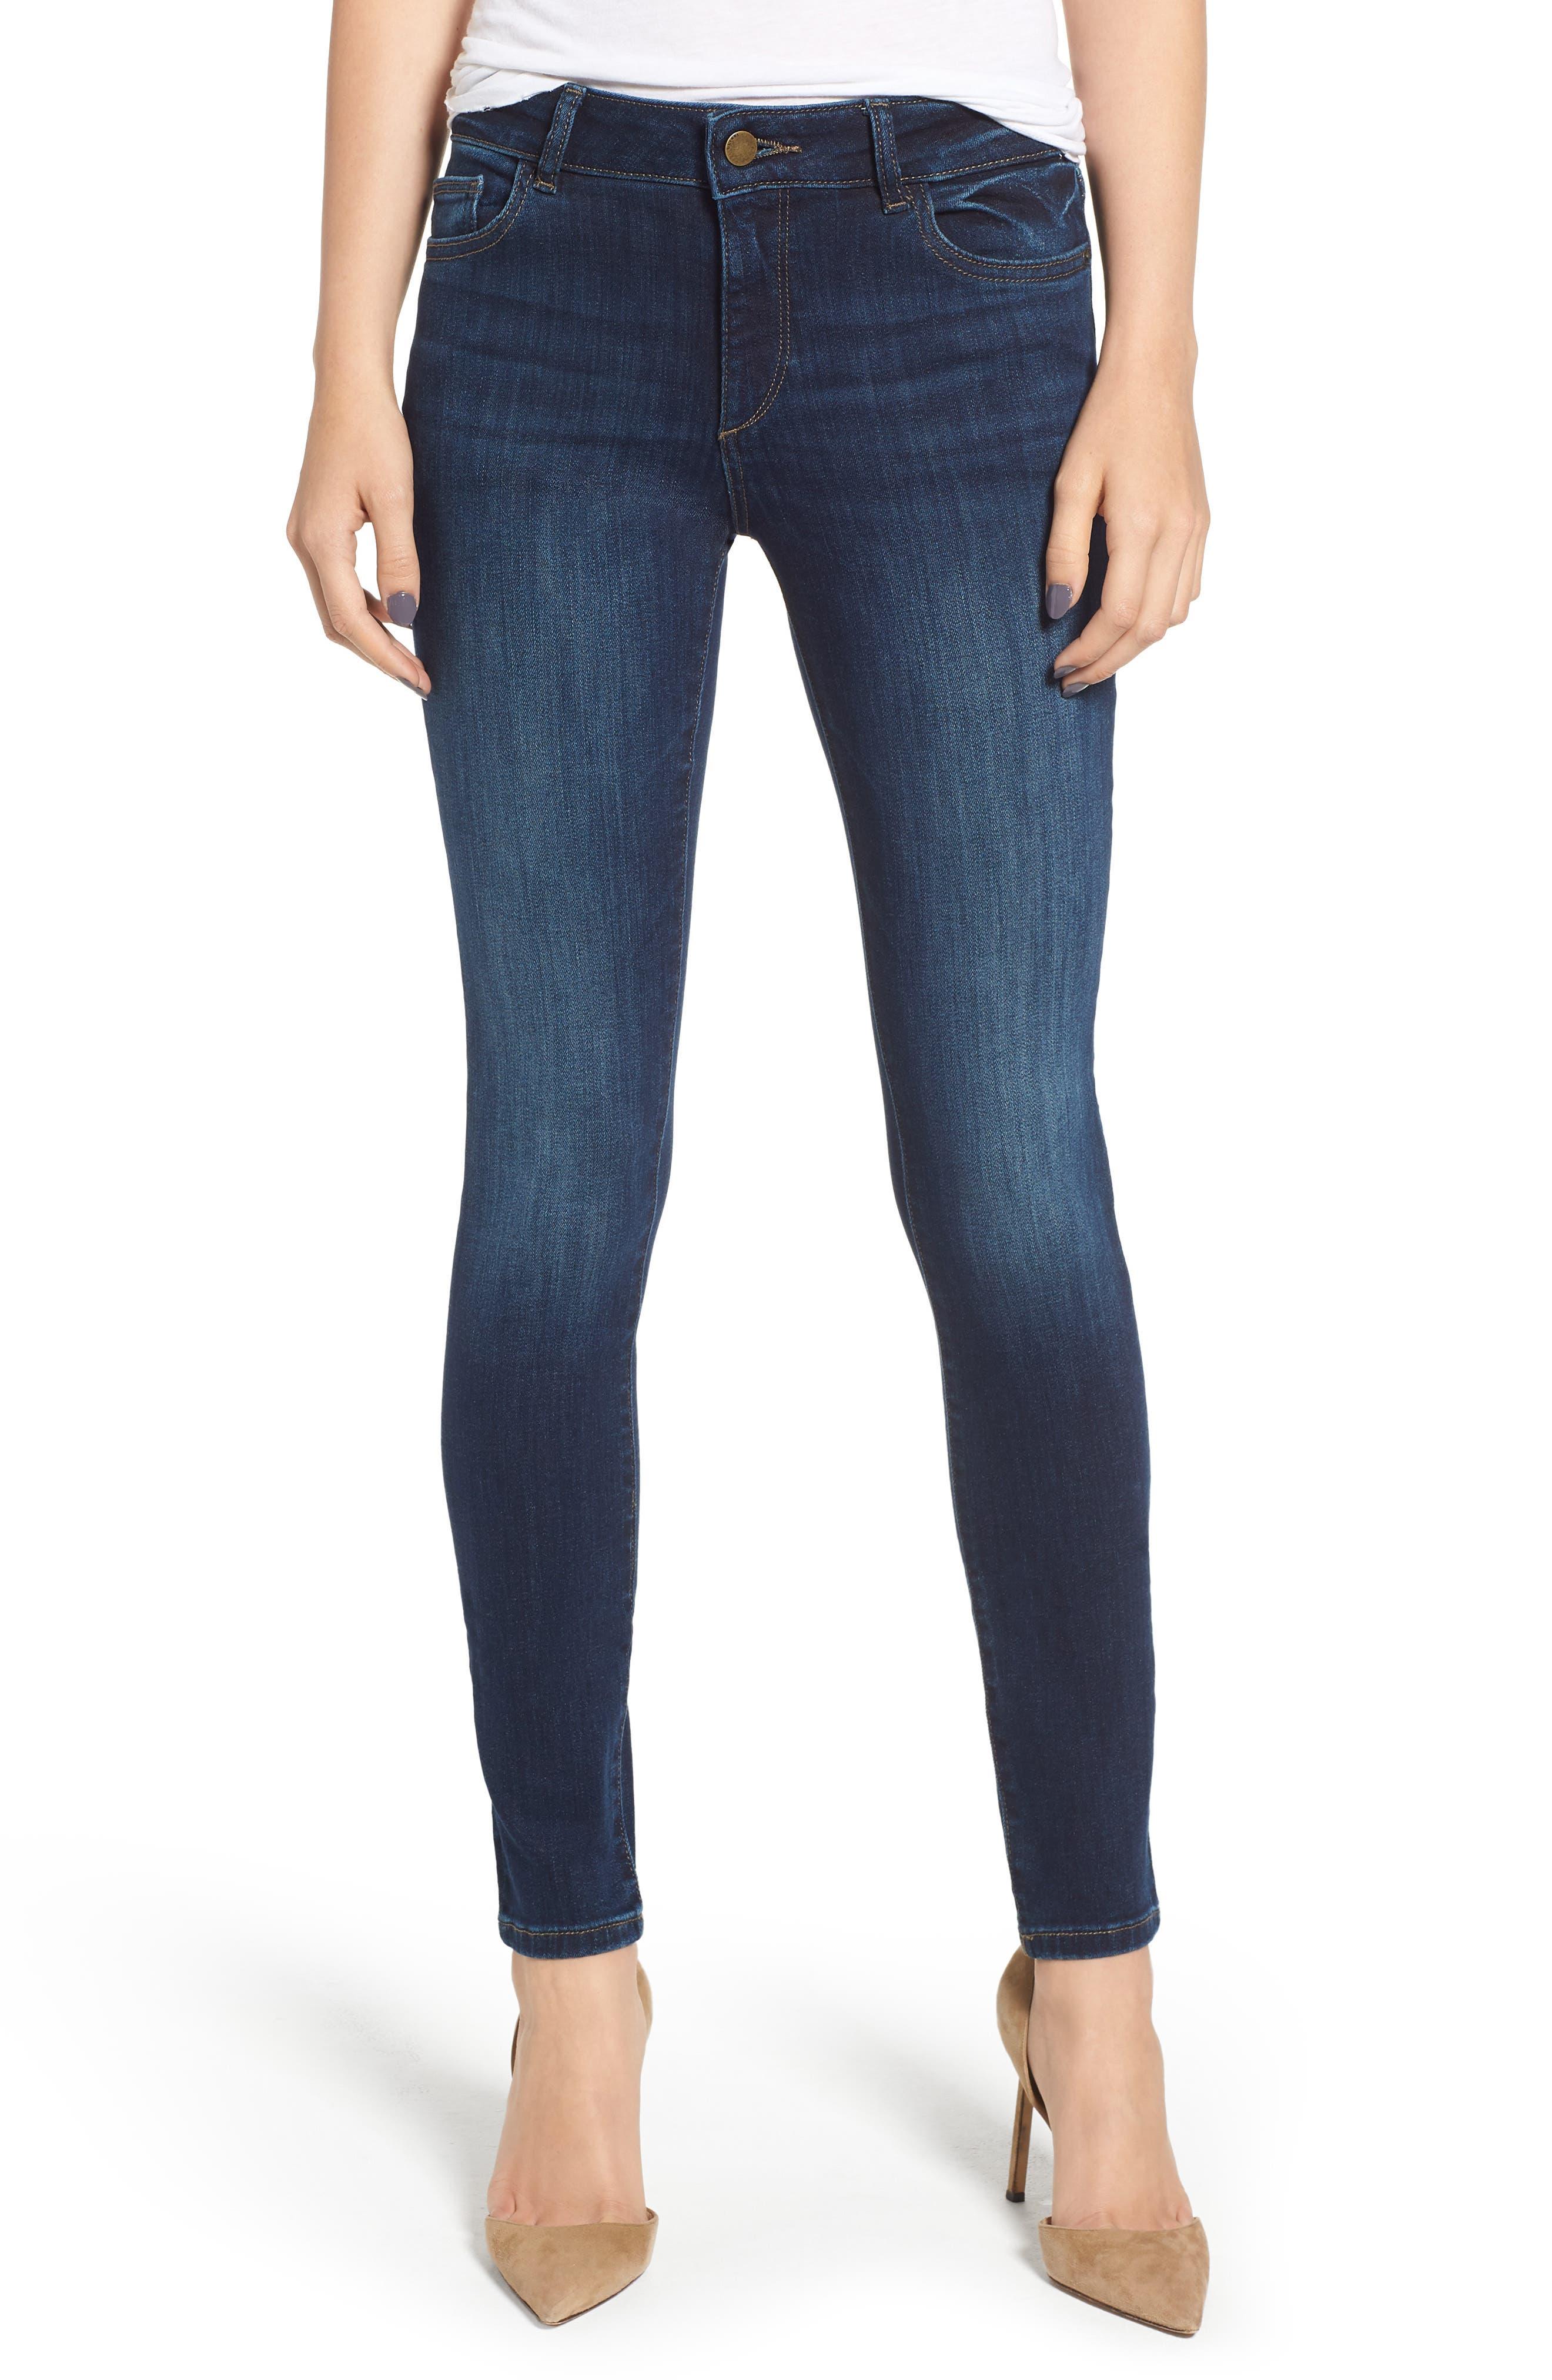 DL1961 Florence Instasculpt Skinny Jeans, Main, color, 410